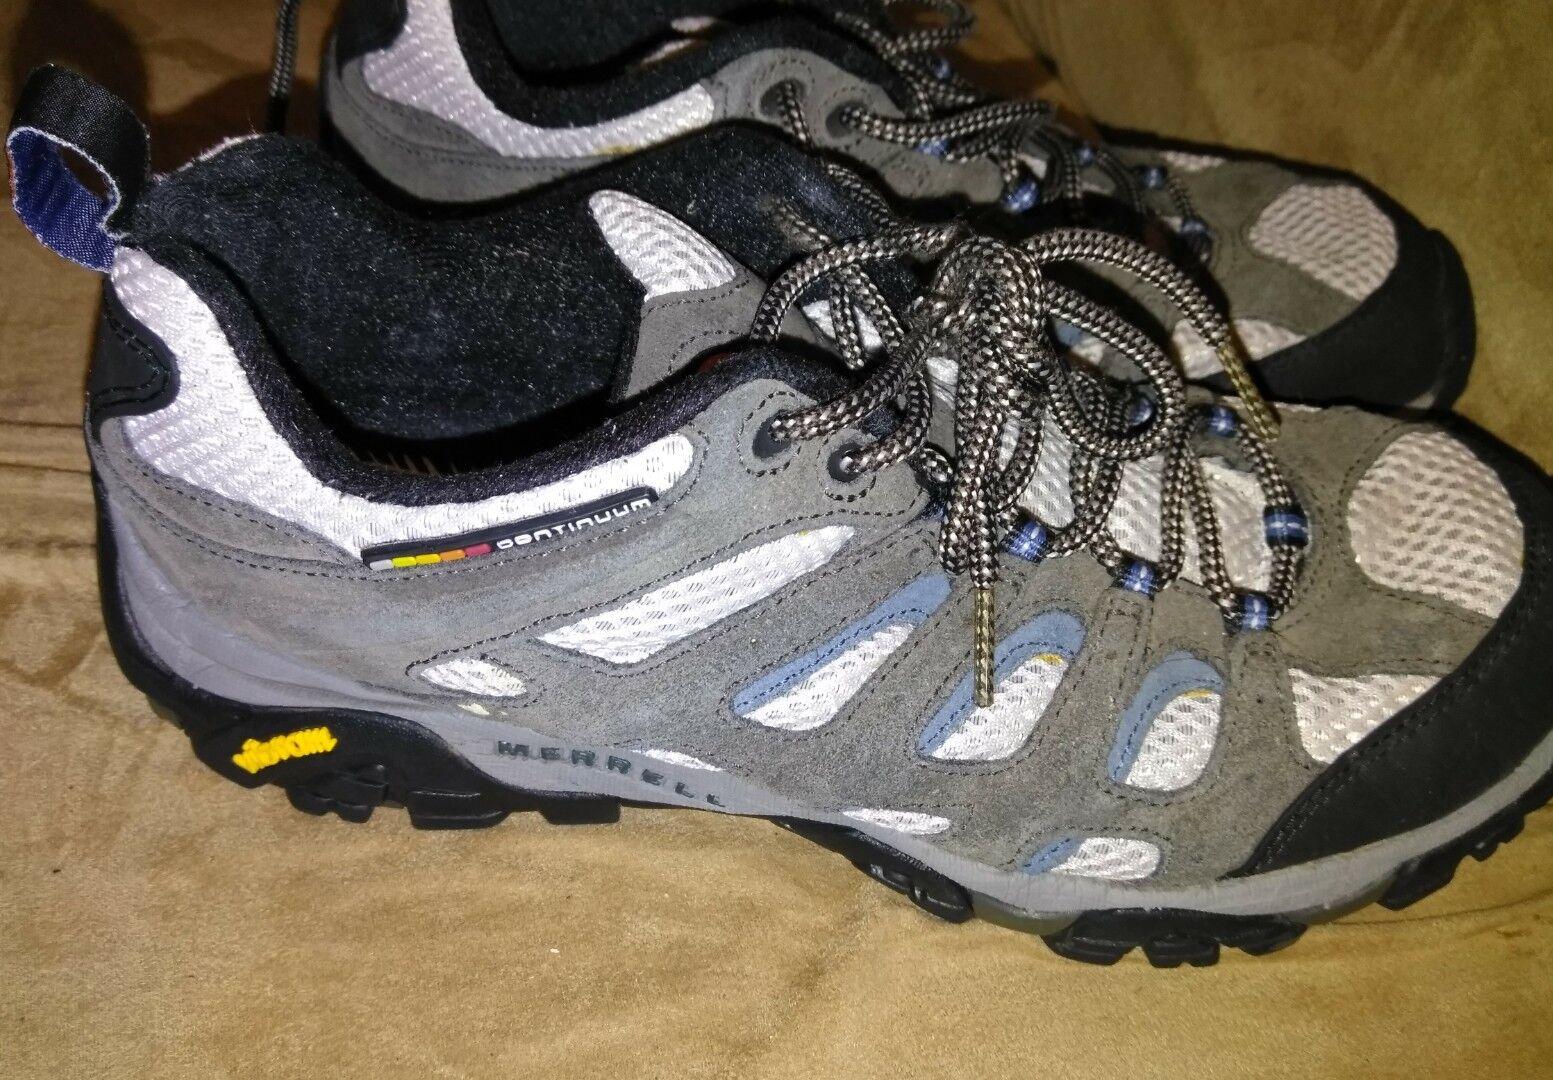 Größe 9.5 men merrell hiking trail schuhe no vibram no schuhe insoles use your old 1s e887f3